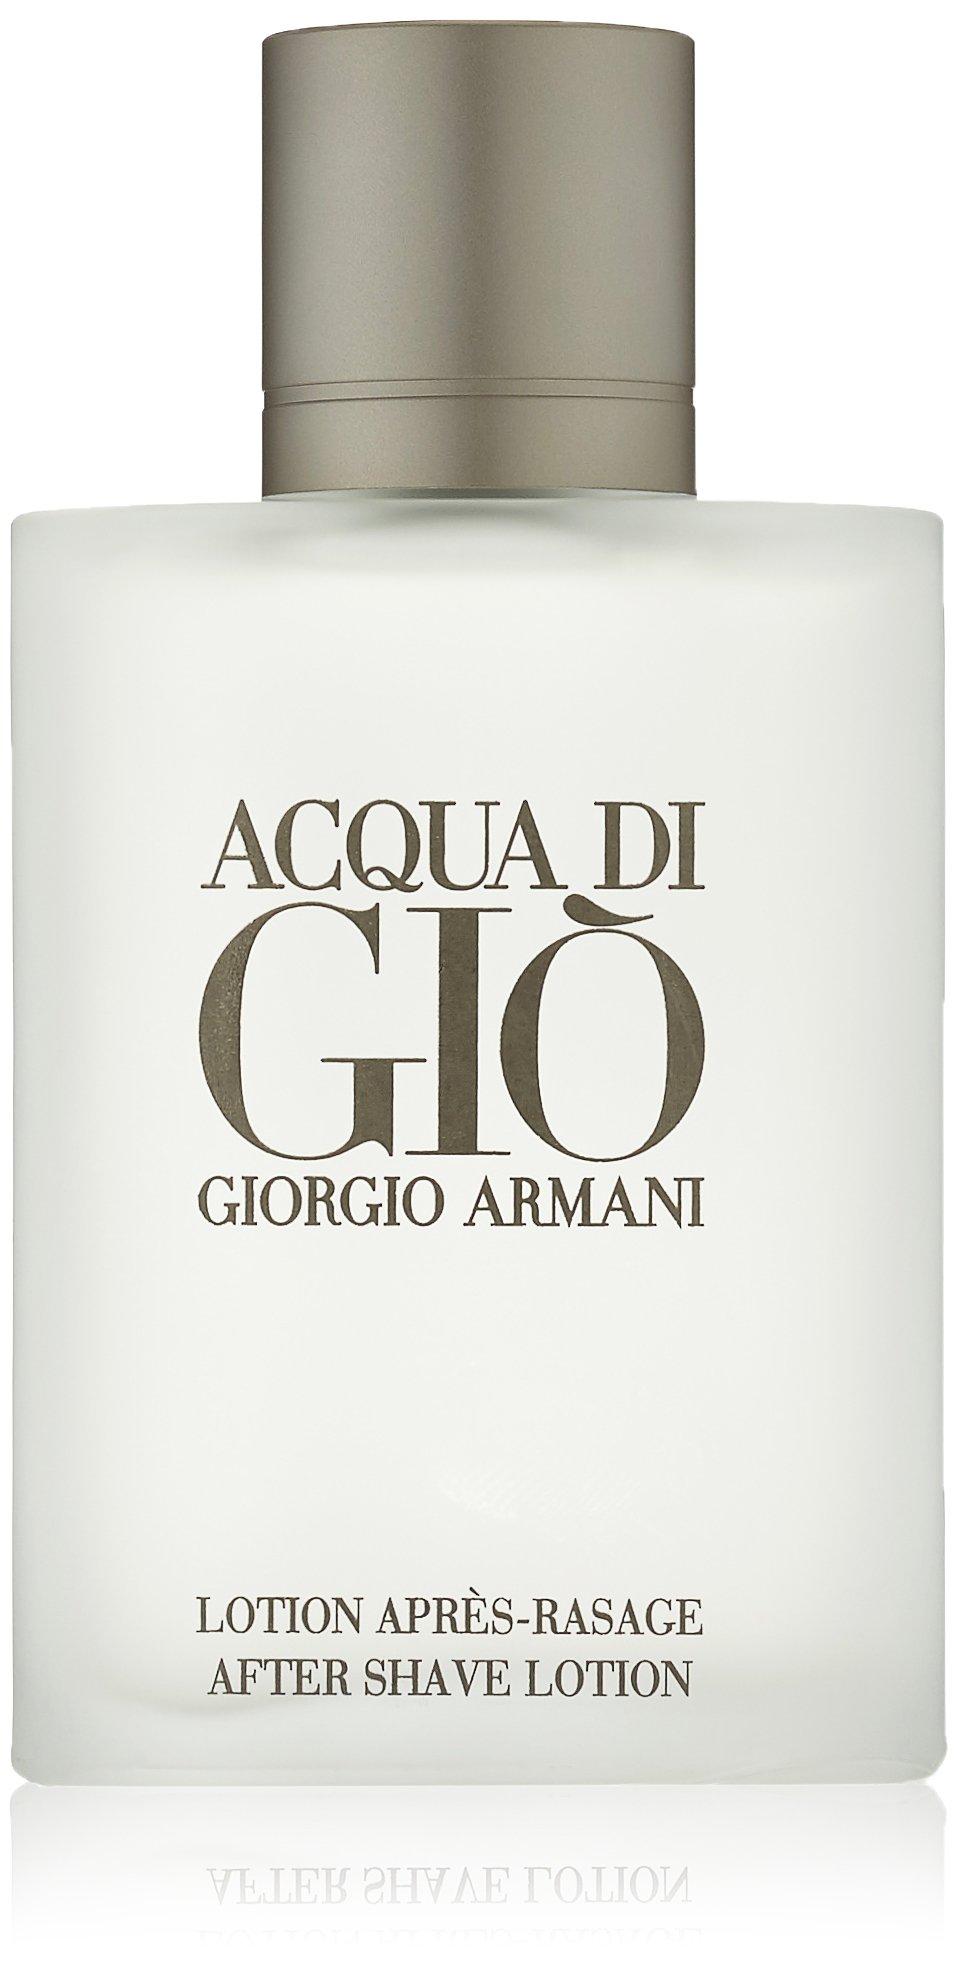 Acqua Di Gio Pour Homme By Giorgio Armani After Shave Lotion, 3.3-Ounce